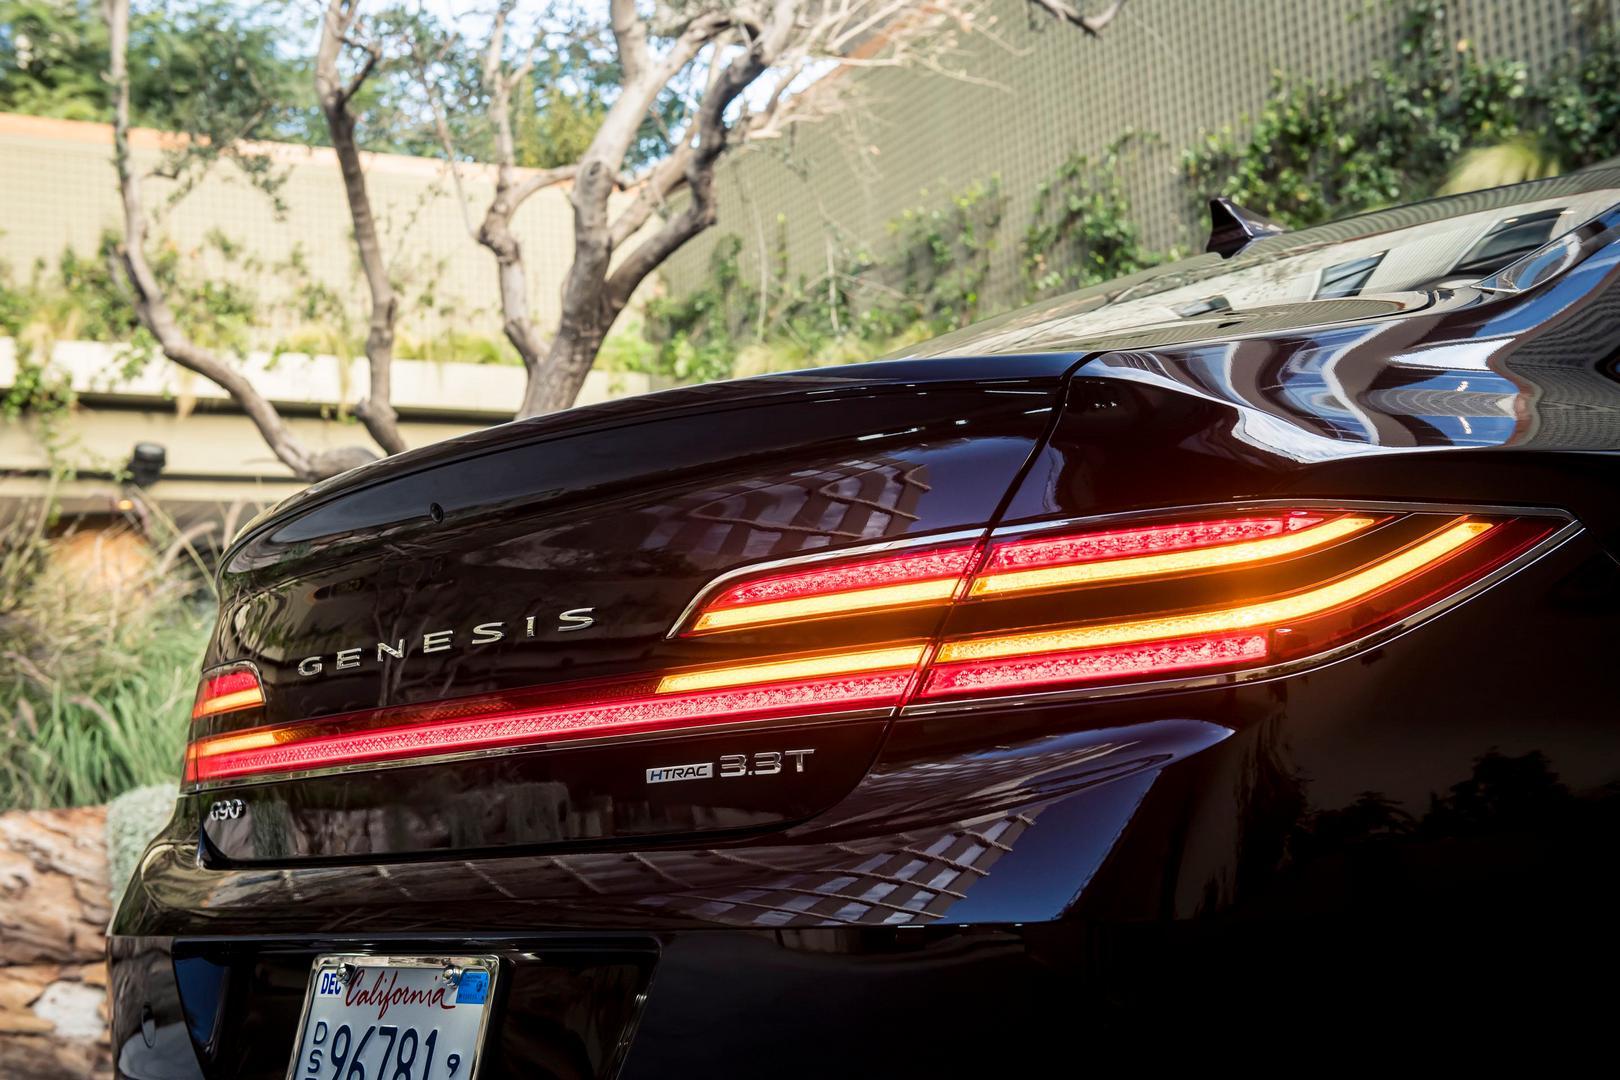 Genesis G90 Rear Lights